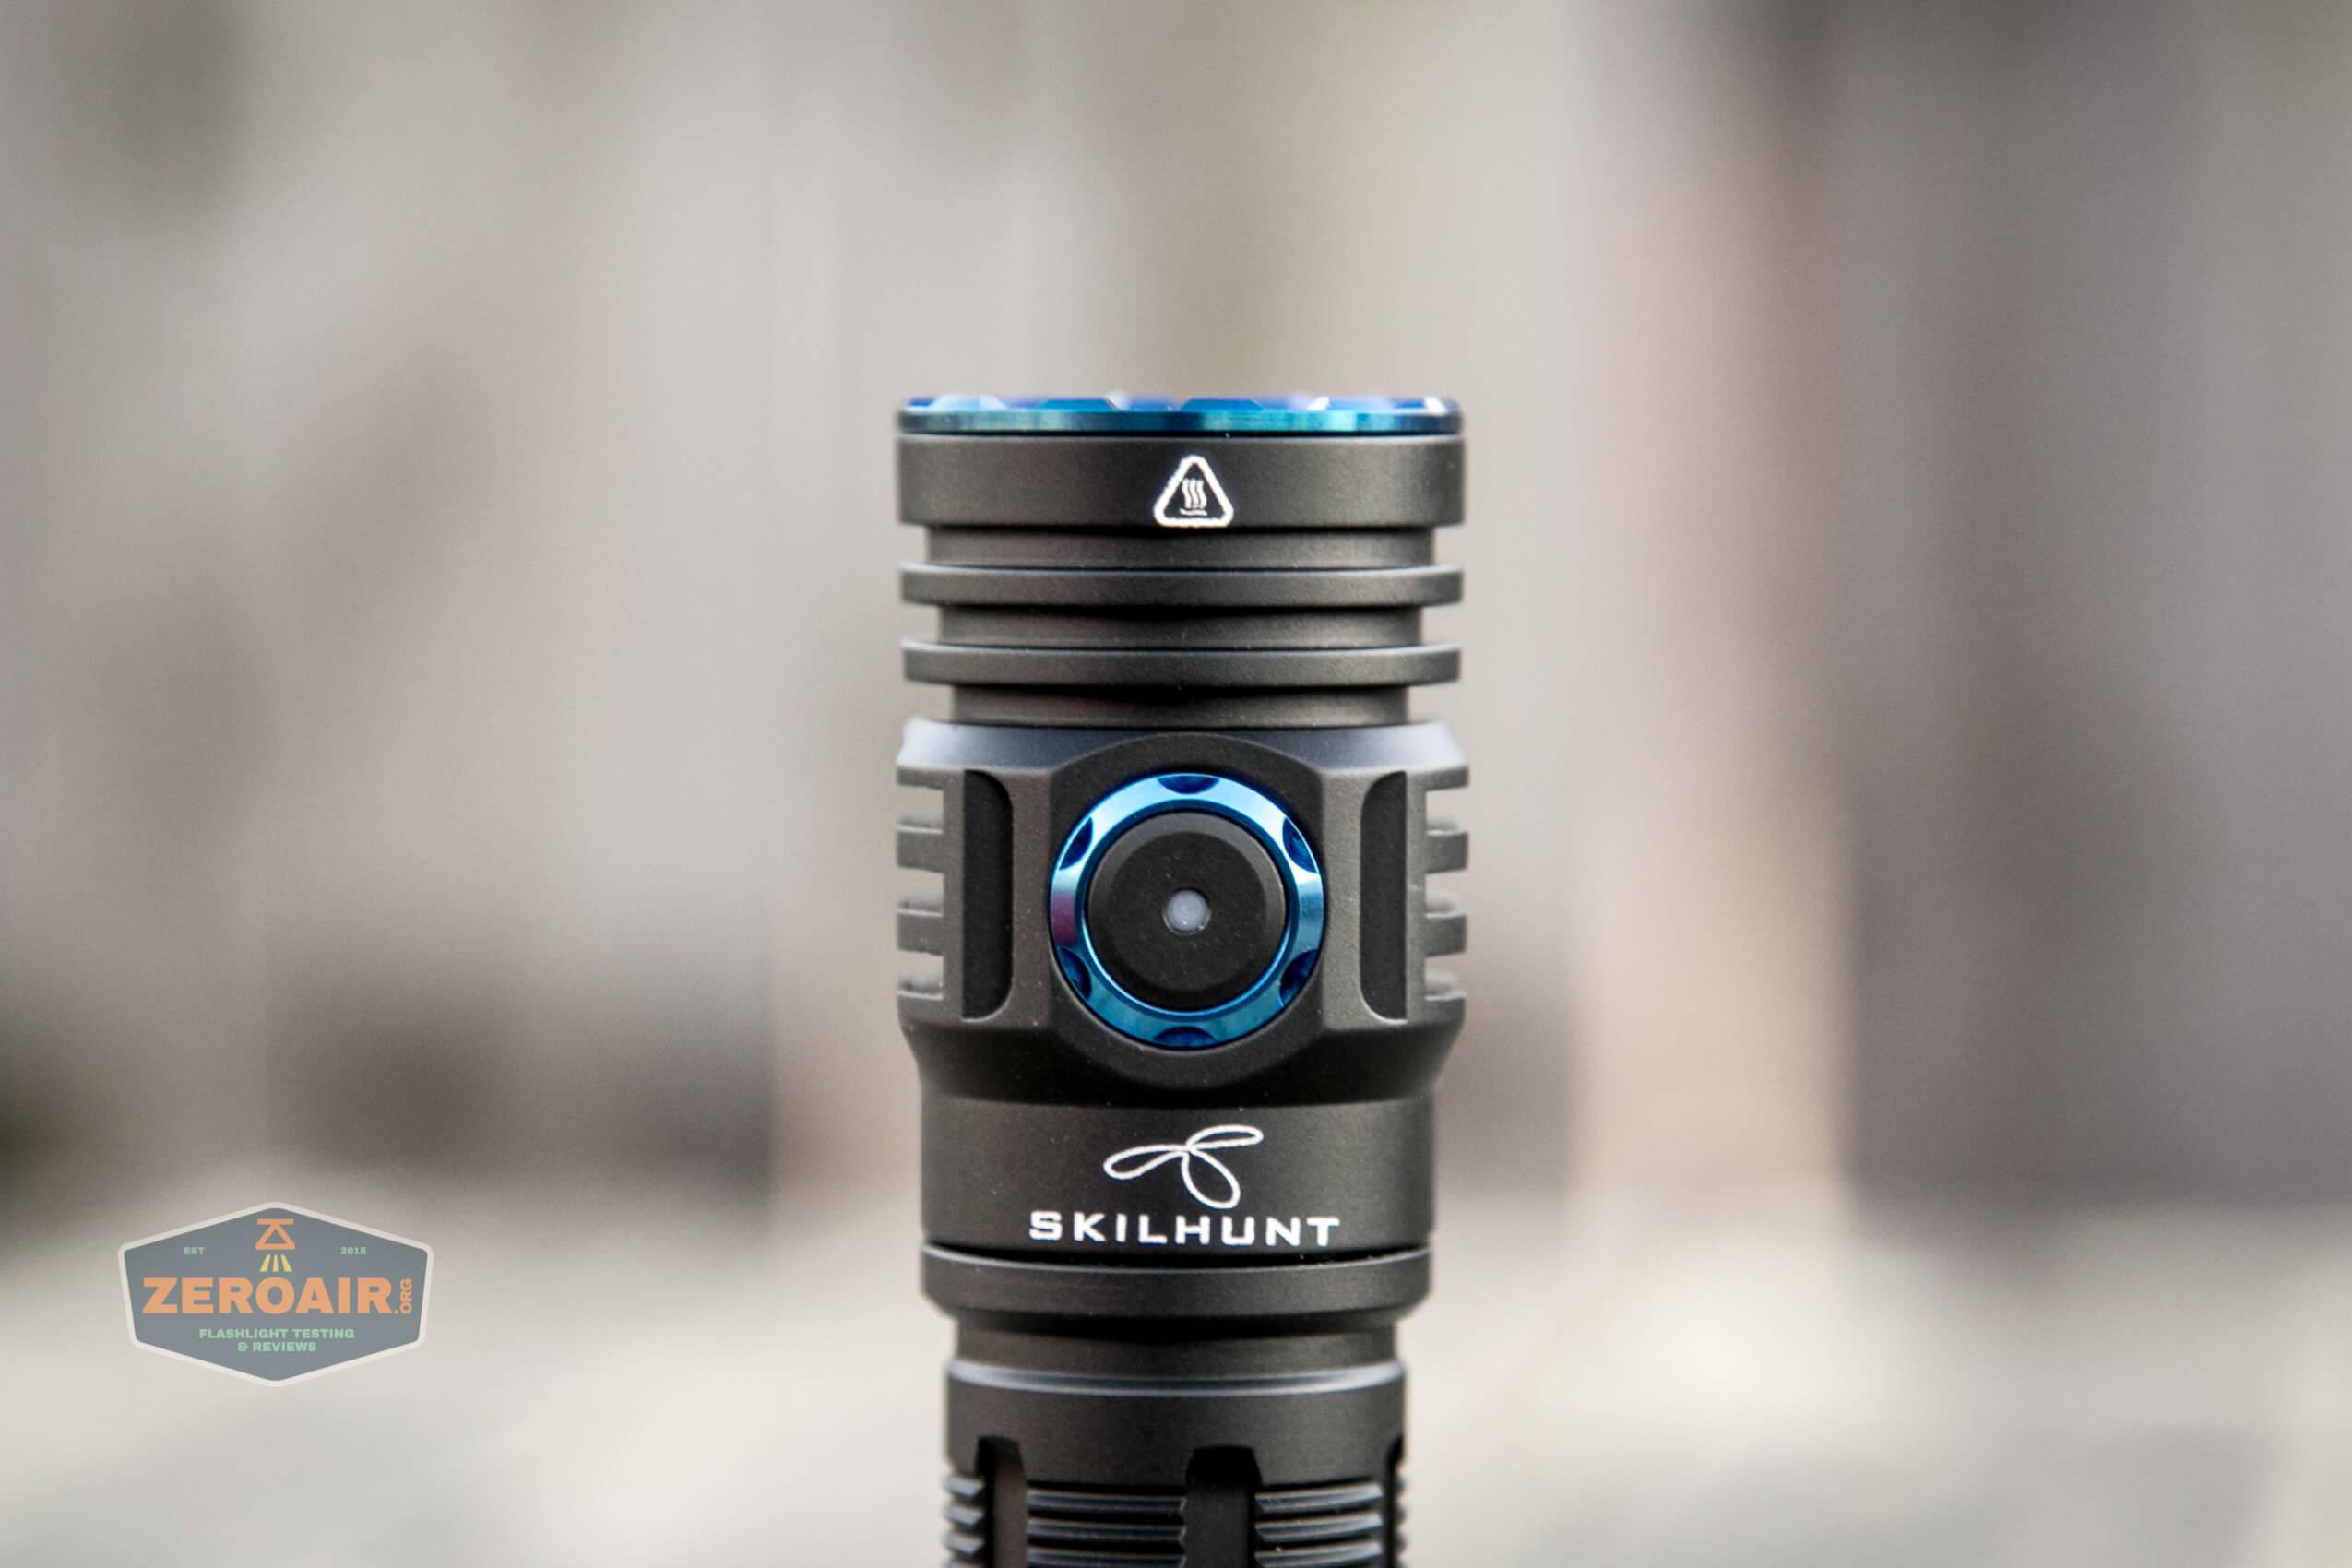 skilhunt m300 18650 flashlight e-switch